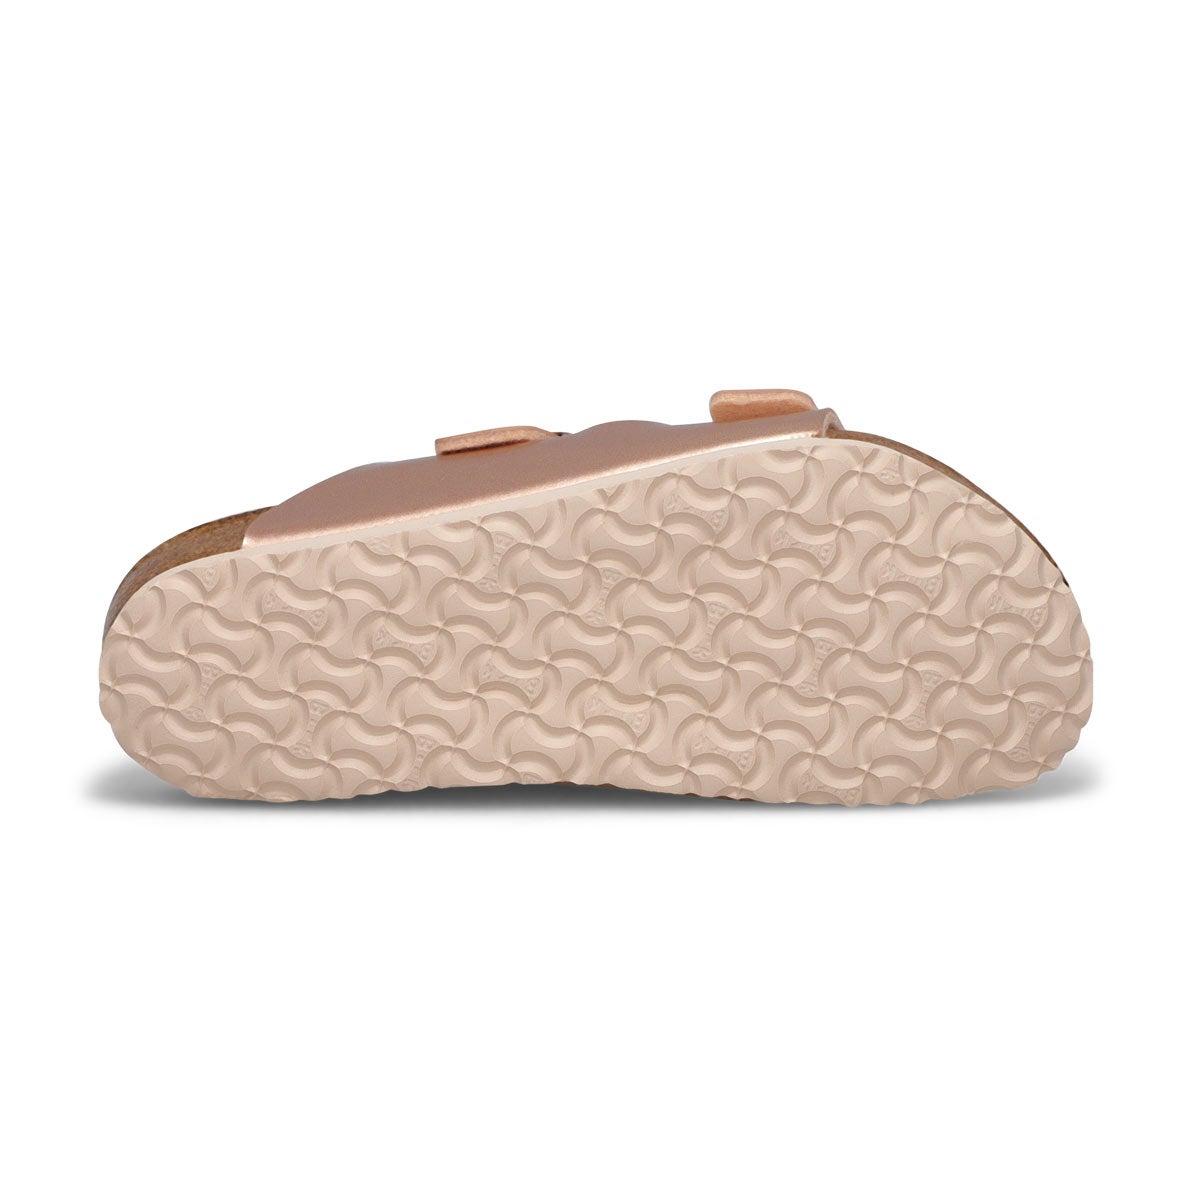 Grls Arizona BF mtl cpr 2 strap sandal-N